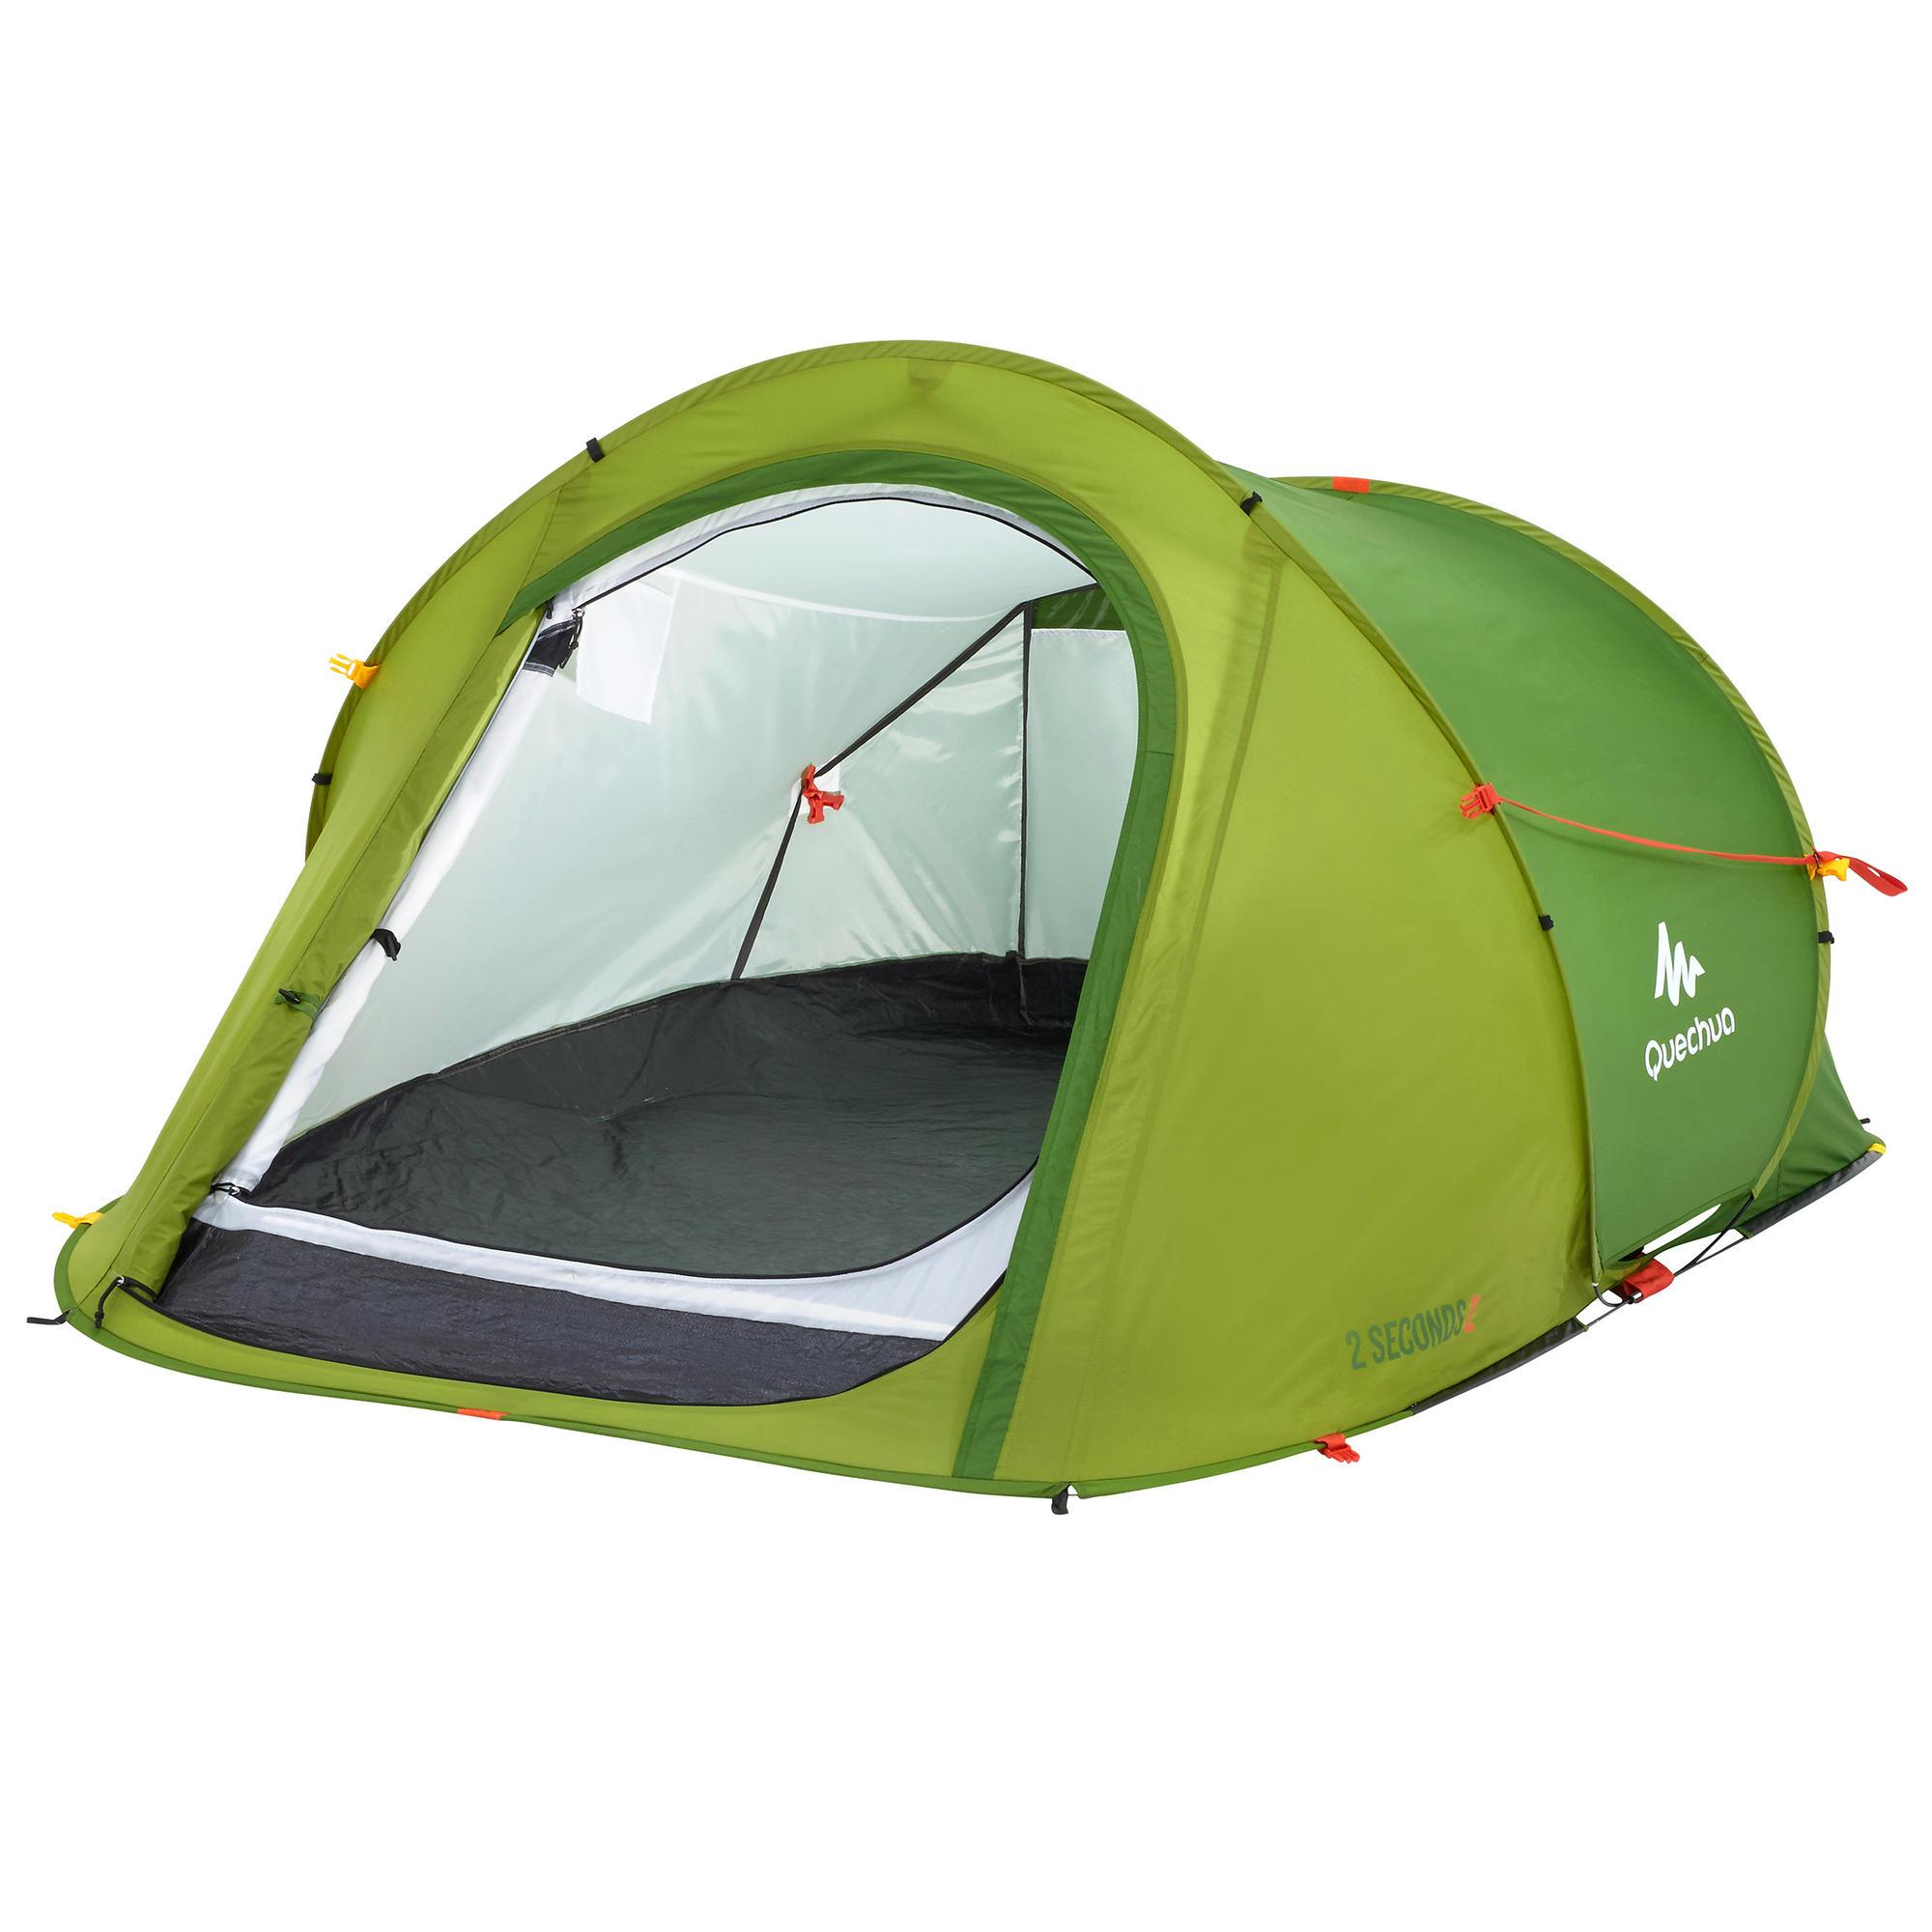 quechua 2 seconds easy ii fresh black 2 man waterproof. Black Bedroom Furniture Sets. Home Design Ideas